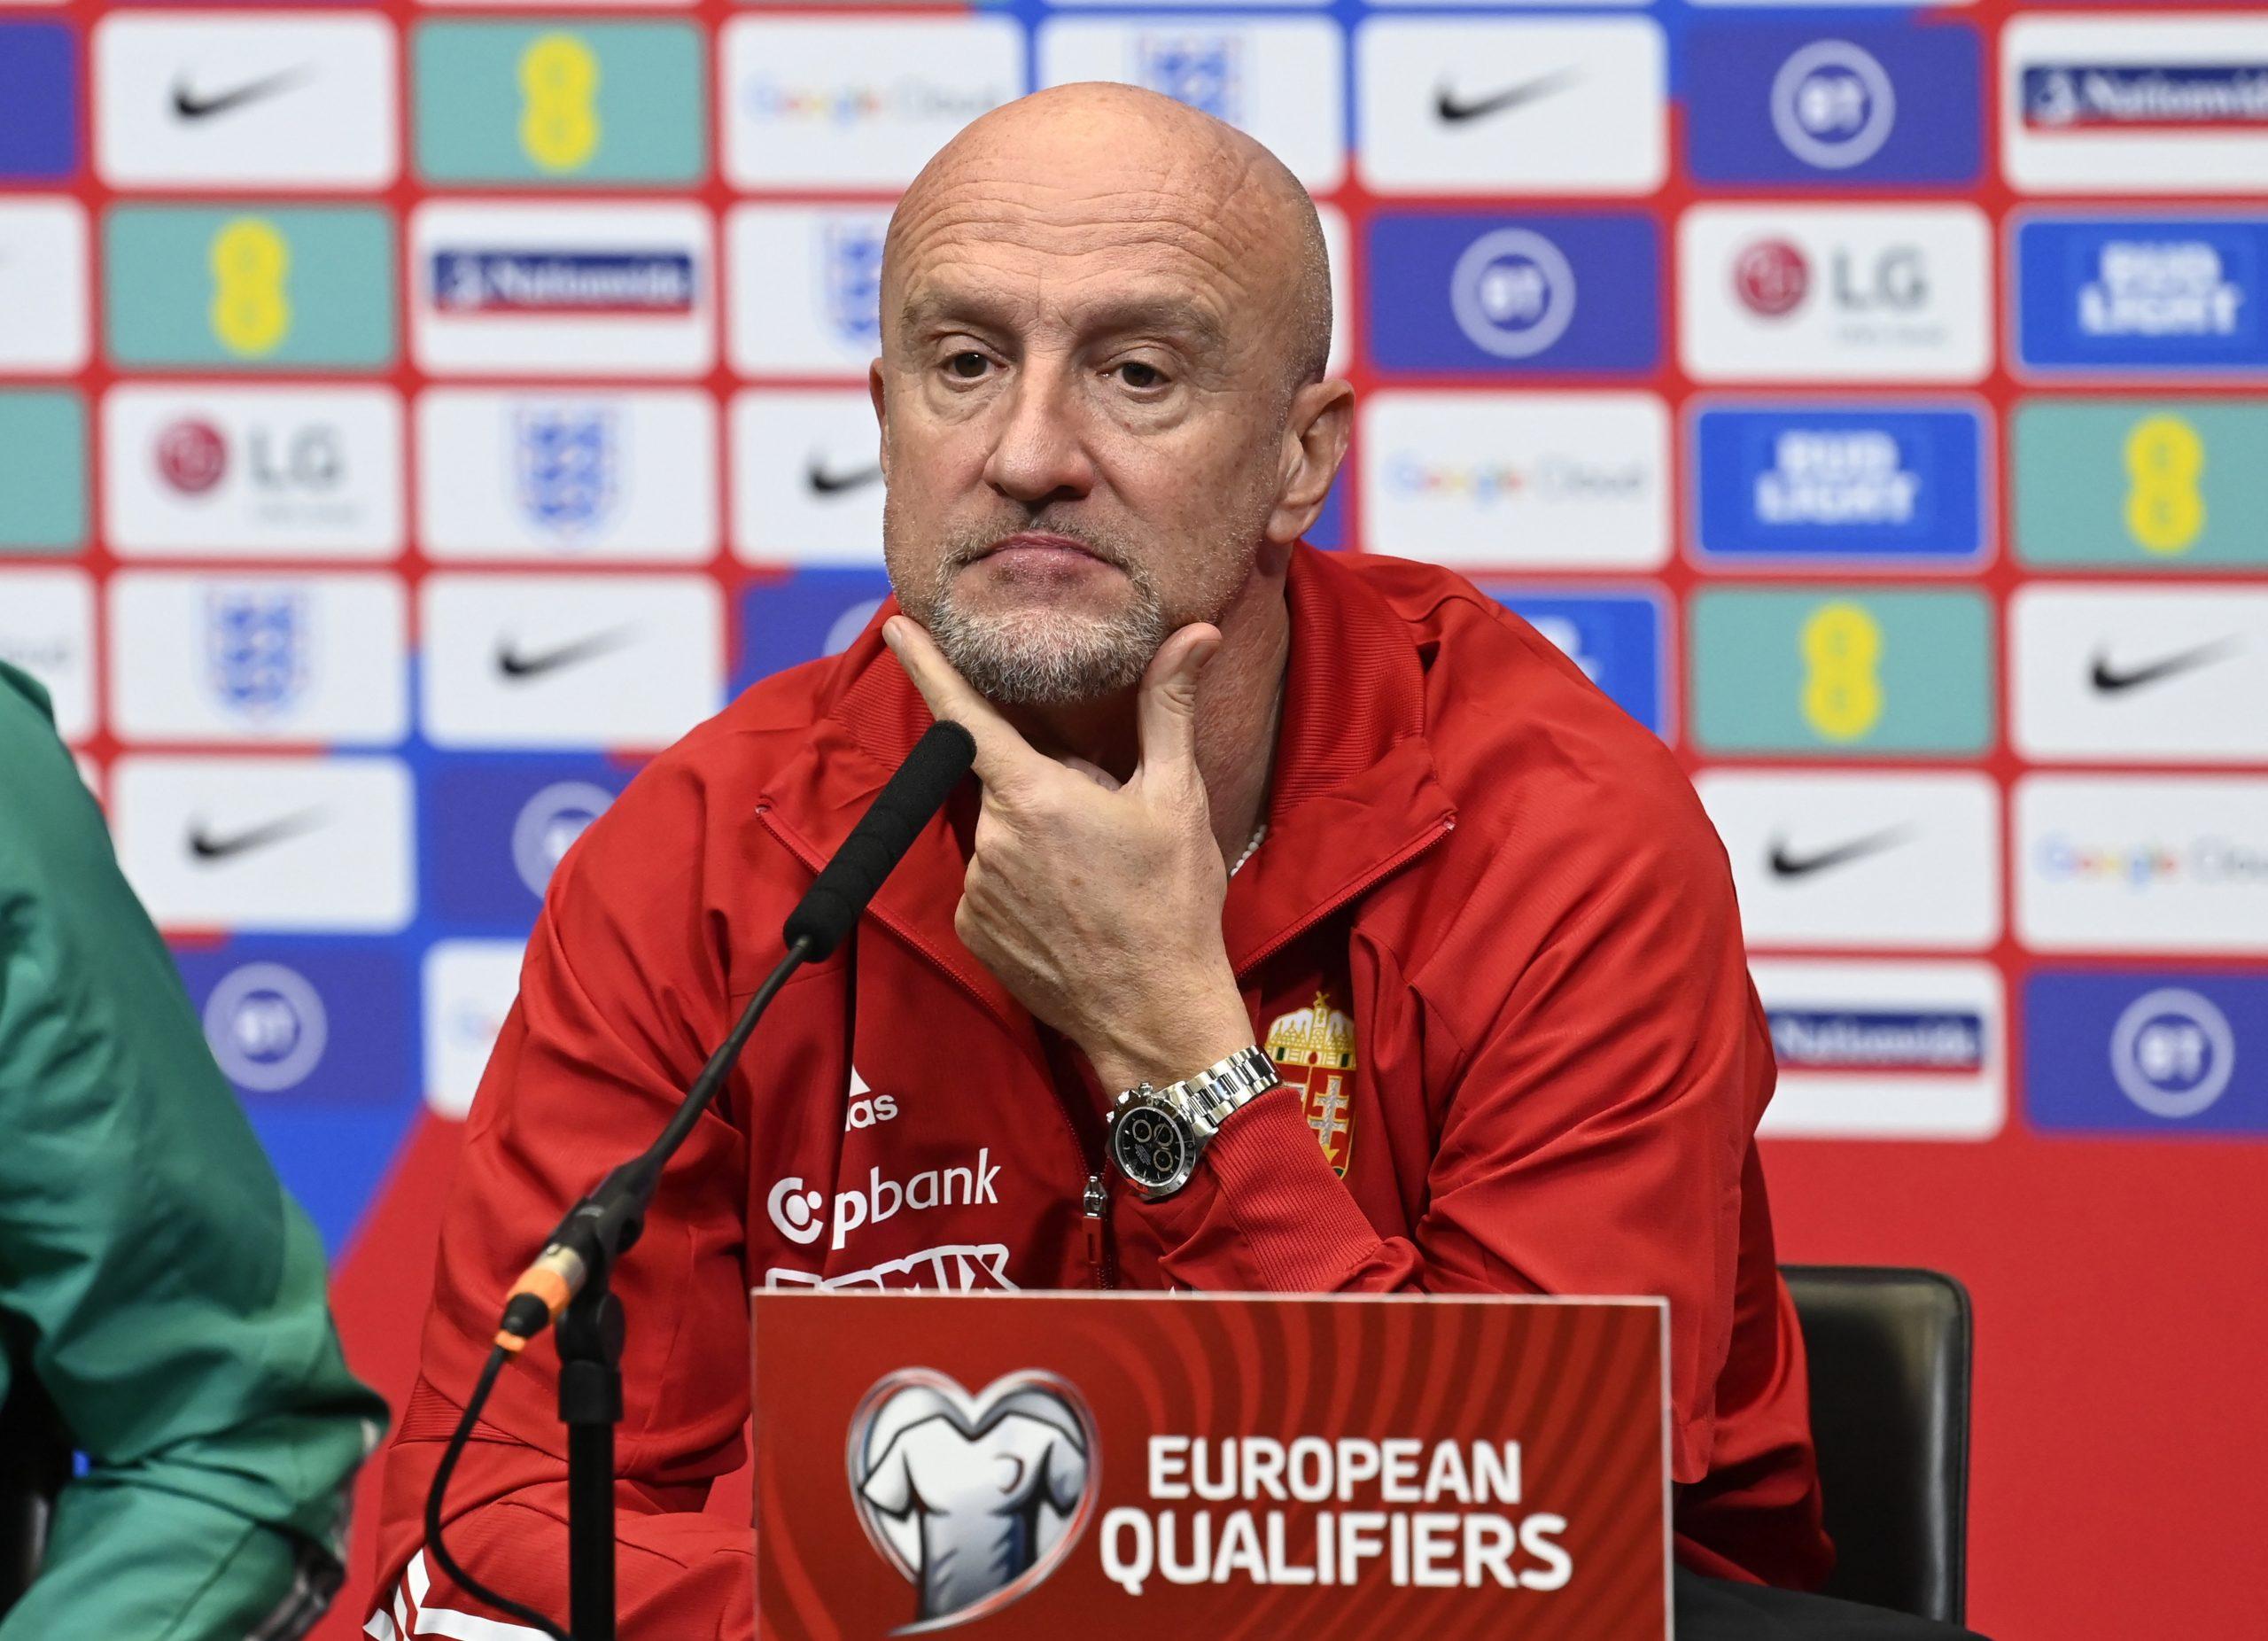 Nationaltrainer Rossi vor England-Spiel: